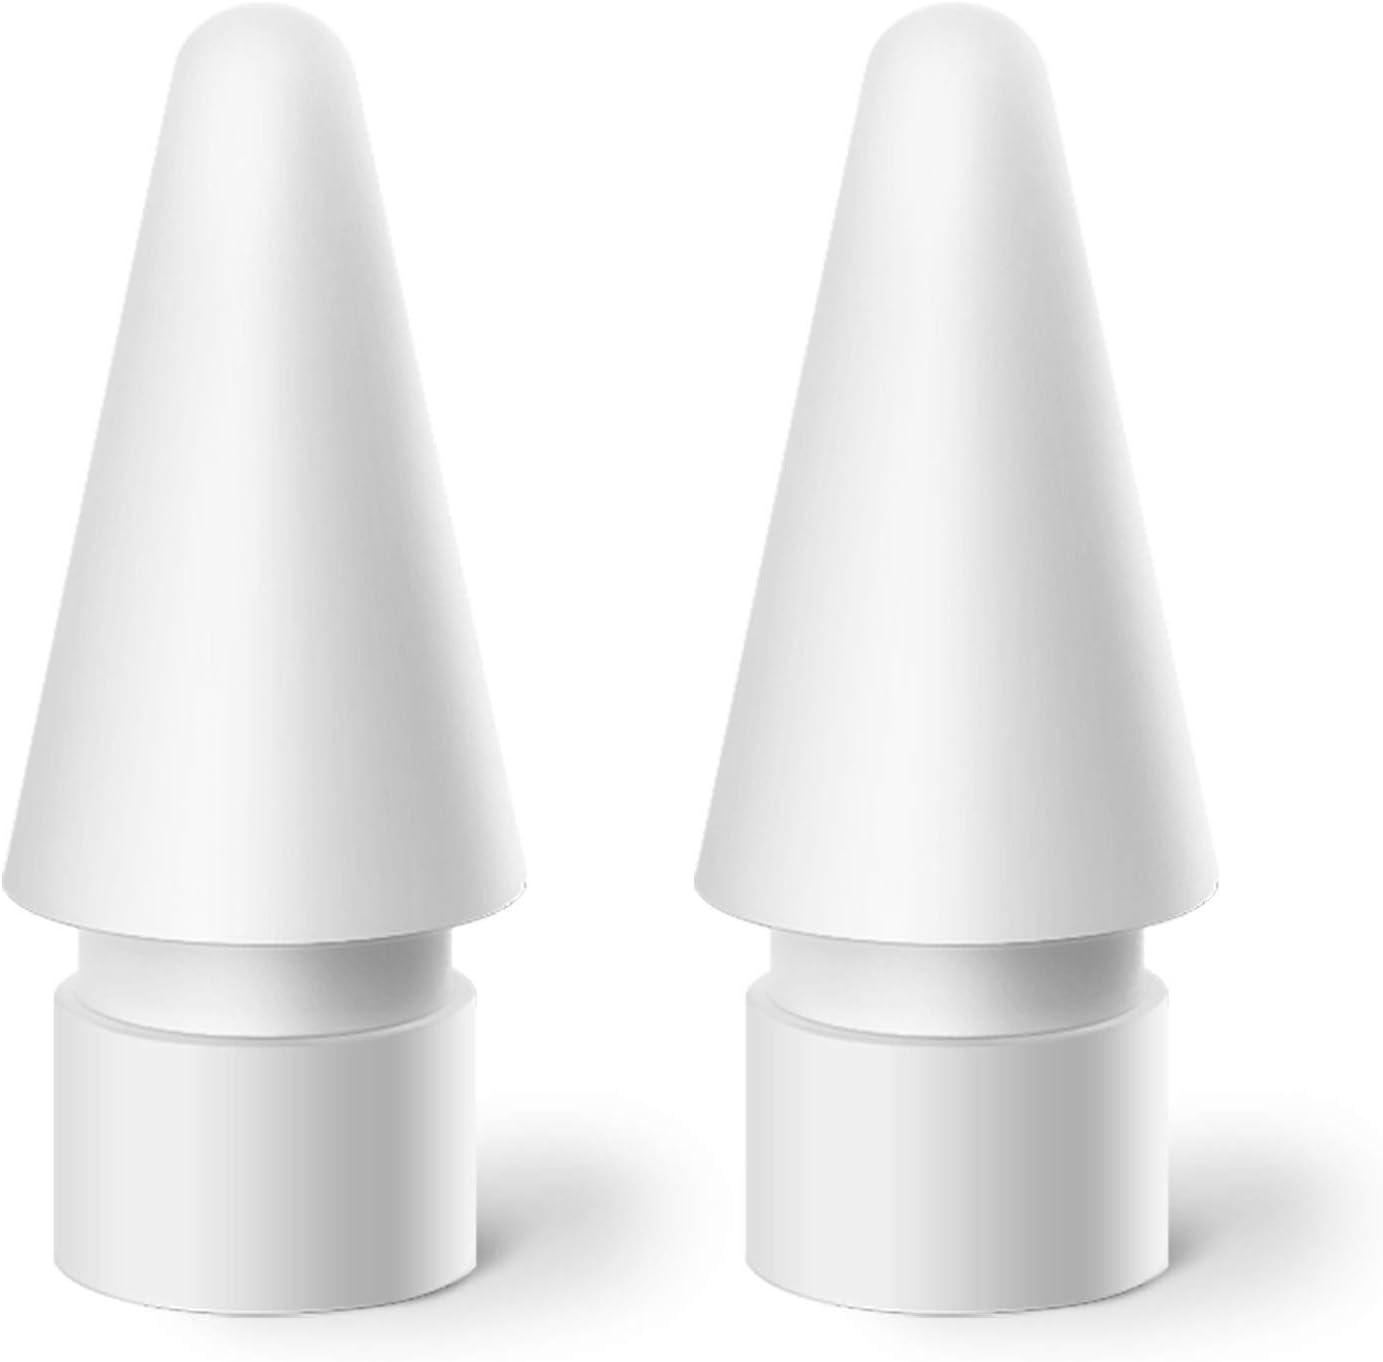 MJKOR Tips Replacement for Apple Pencil 1st Gen & 2nd Gen, Pen Nibs for iPad Pro (2 Pack)